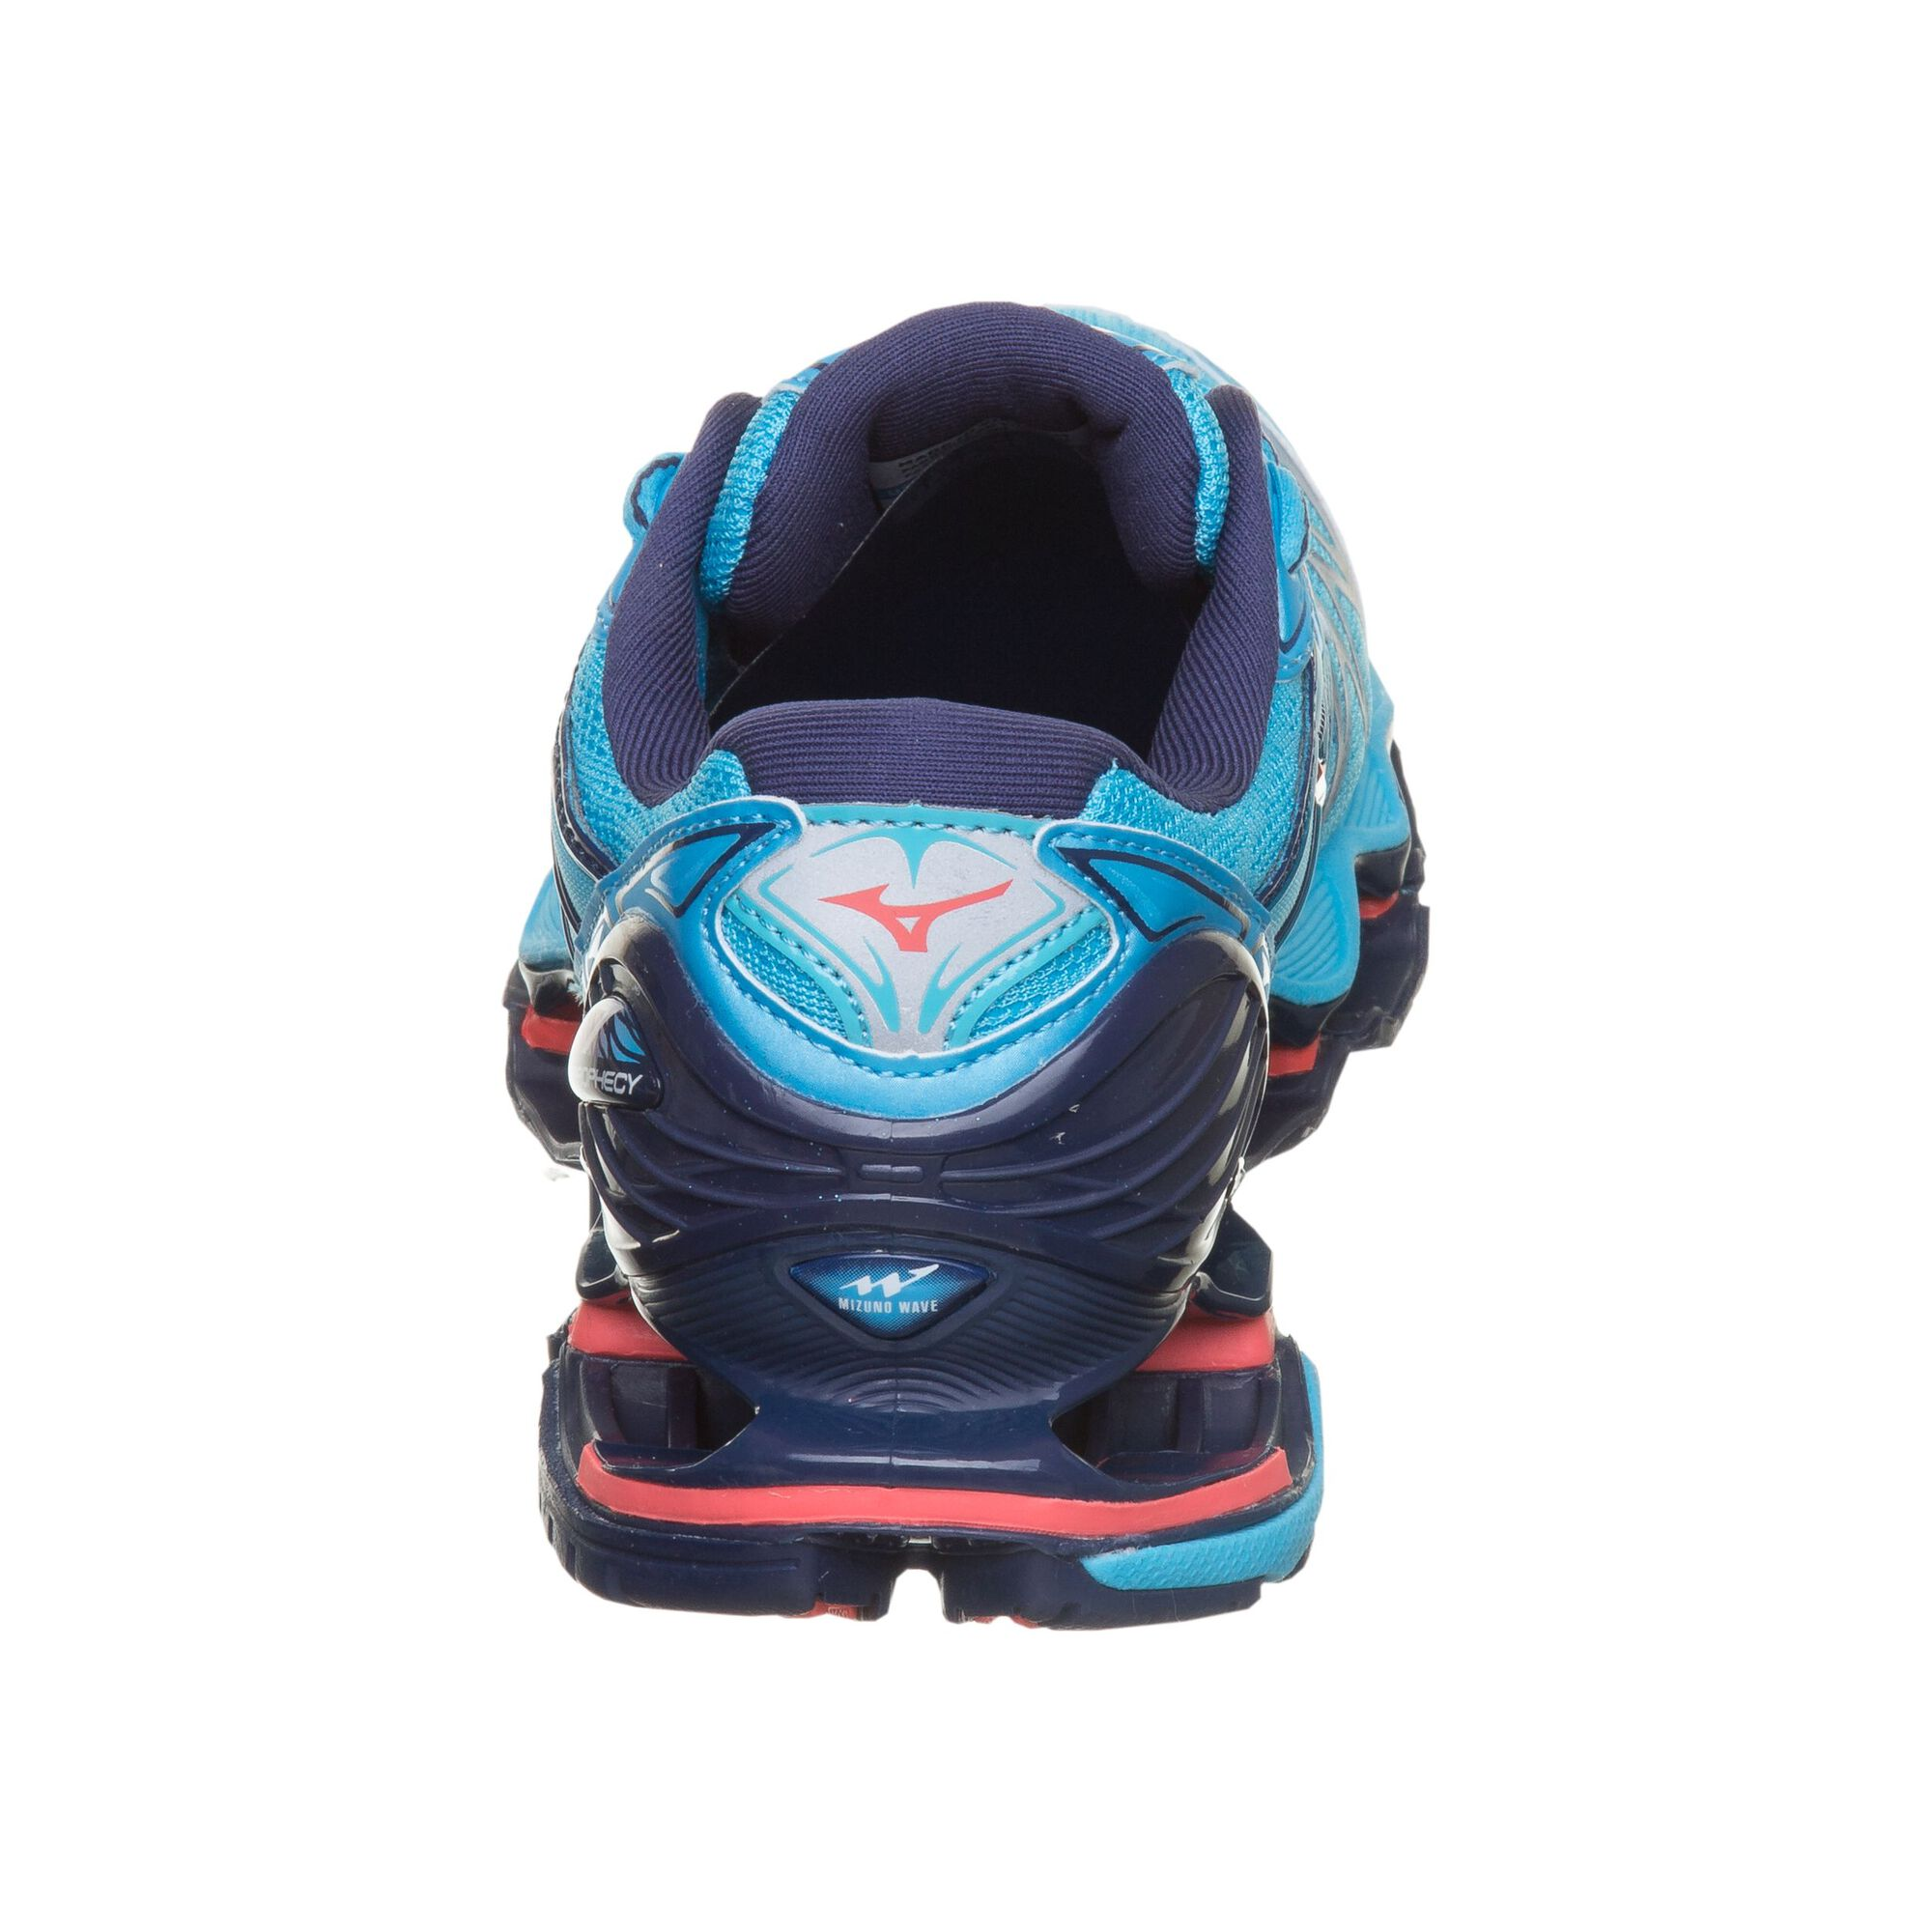 info for 80e43 4bce5 buy Mizuno Wave Prophecy 7 Neutral Running Shoe Women - Light Blue ...